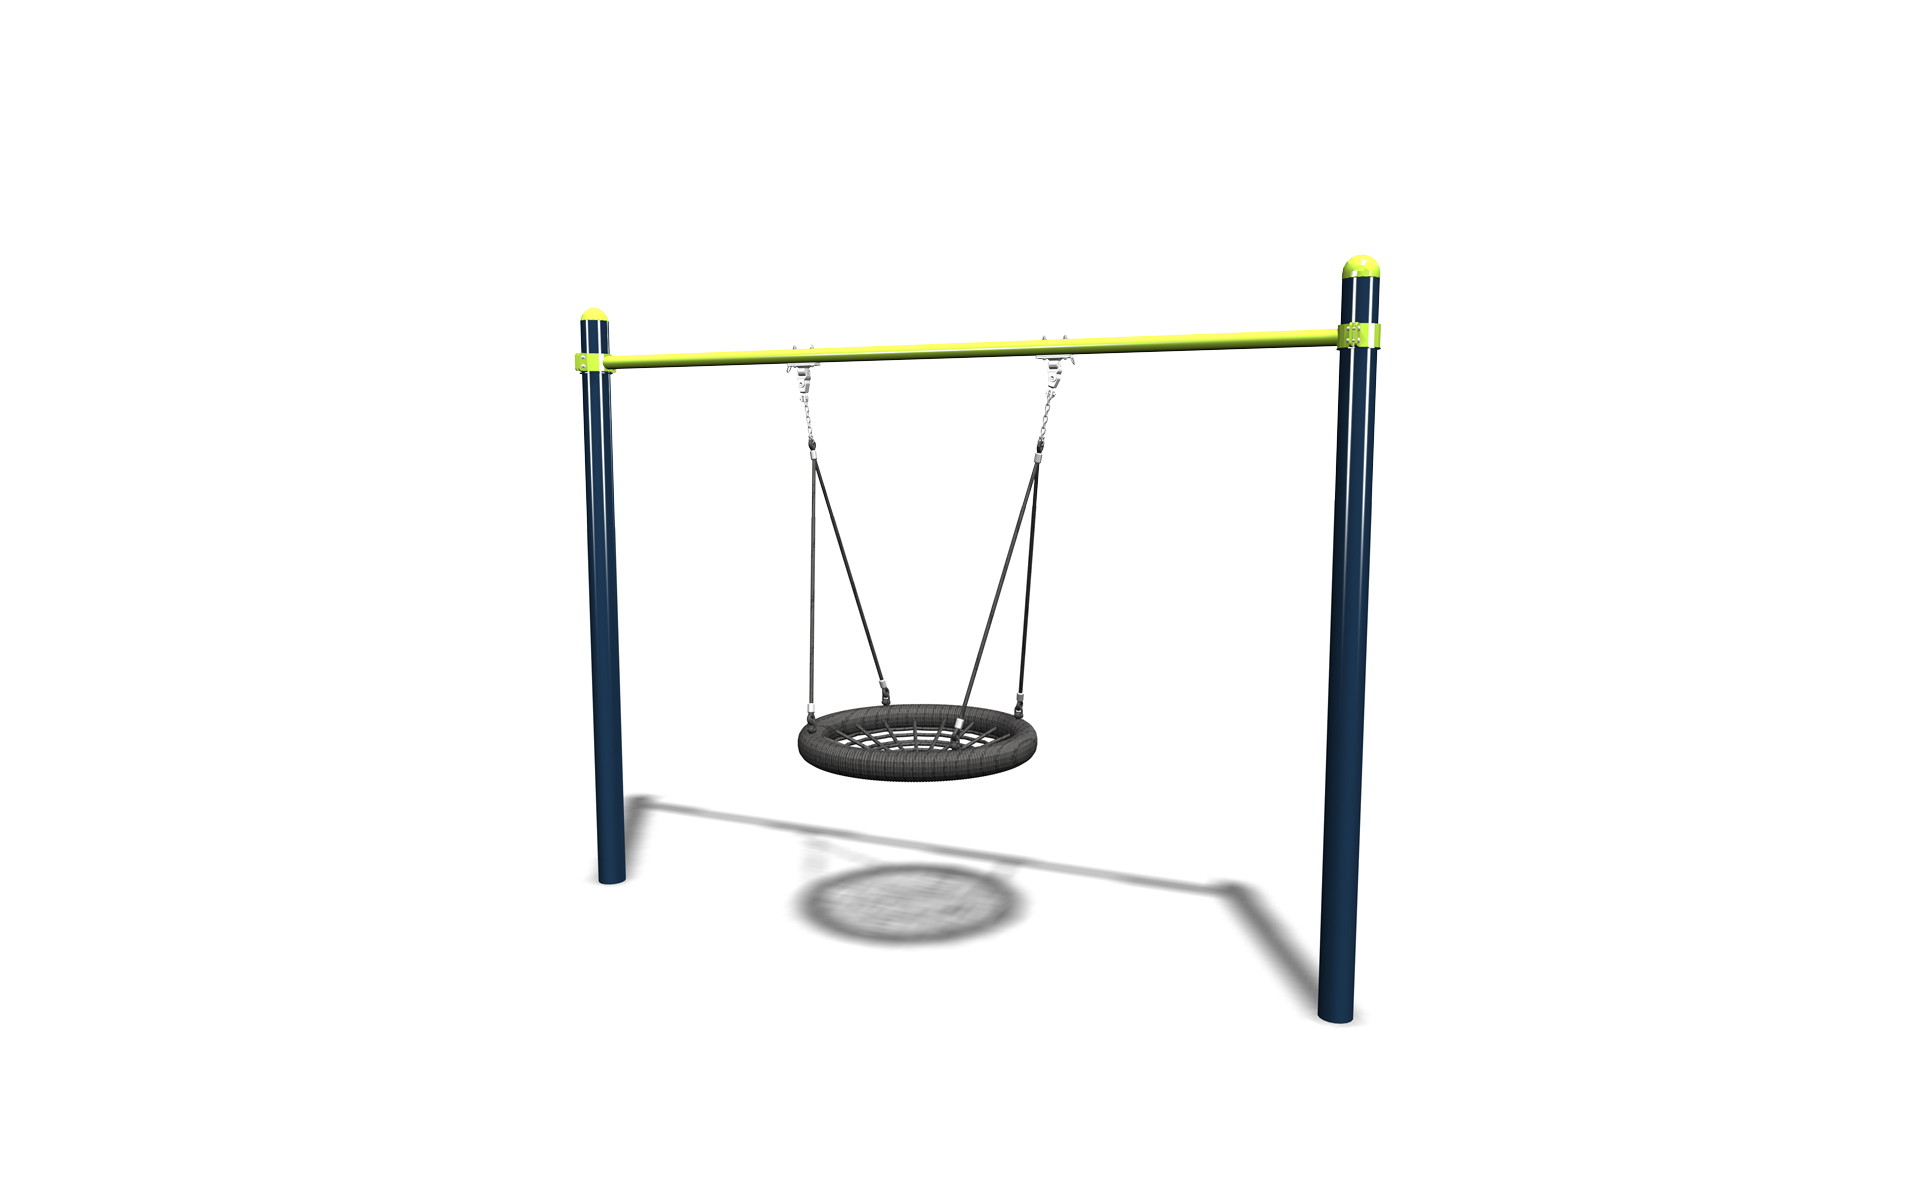 omni-swing-1-bay-basket.jpg